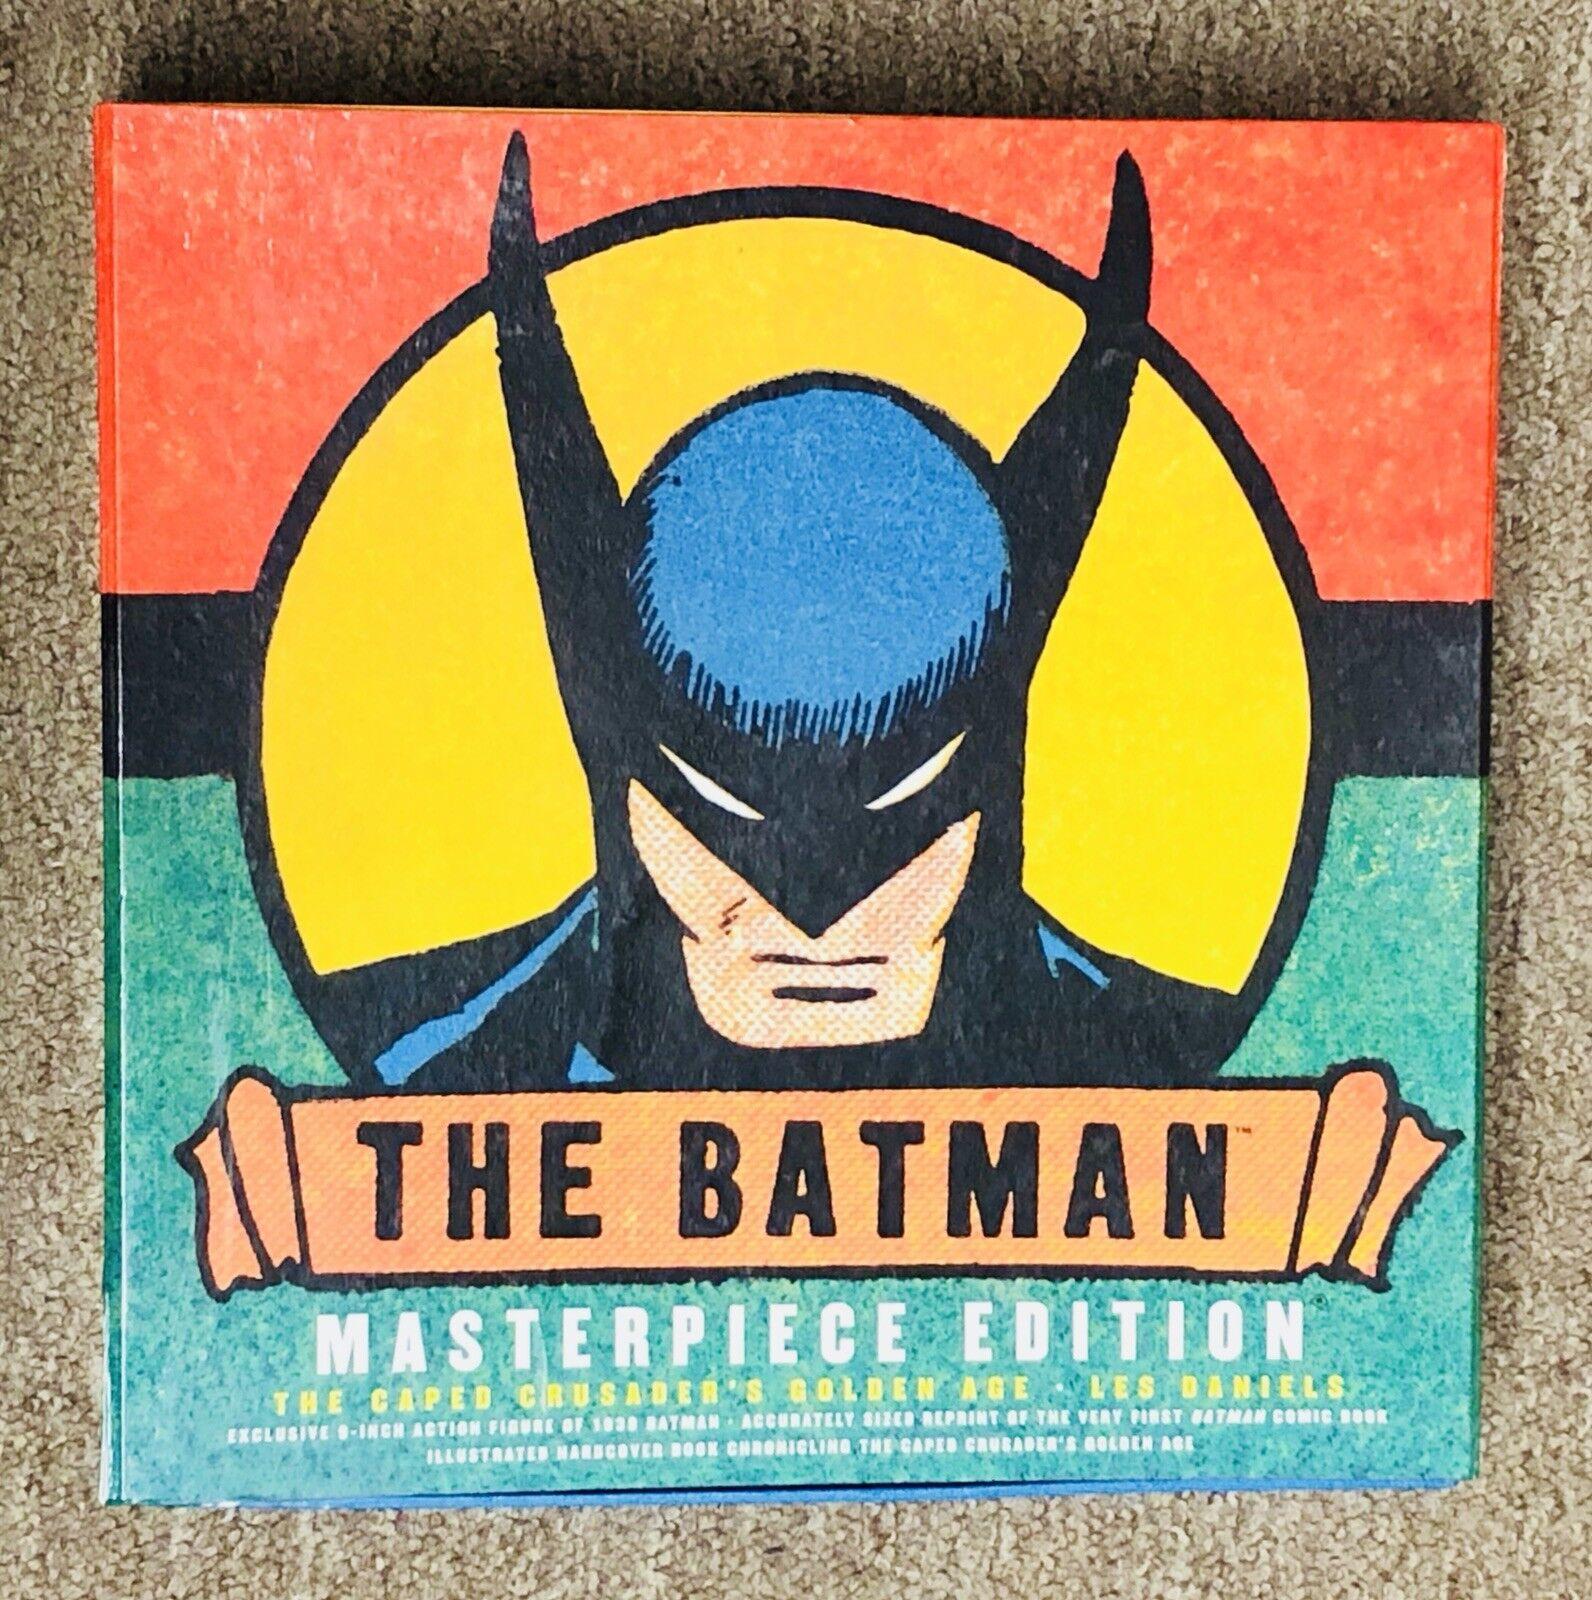 BATMAN 1 Comic and Figure Masterpiece Edition, golden Age, Rare. Limited.